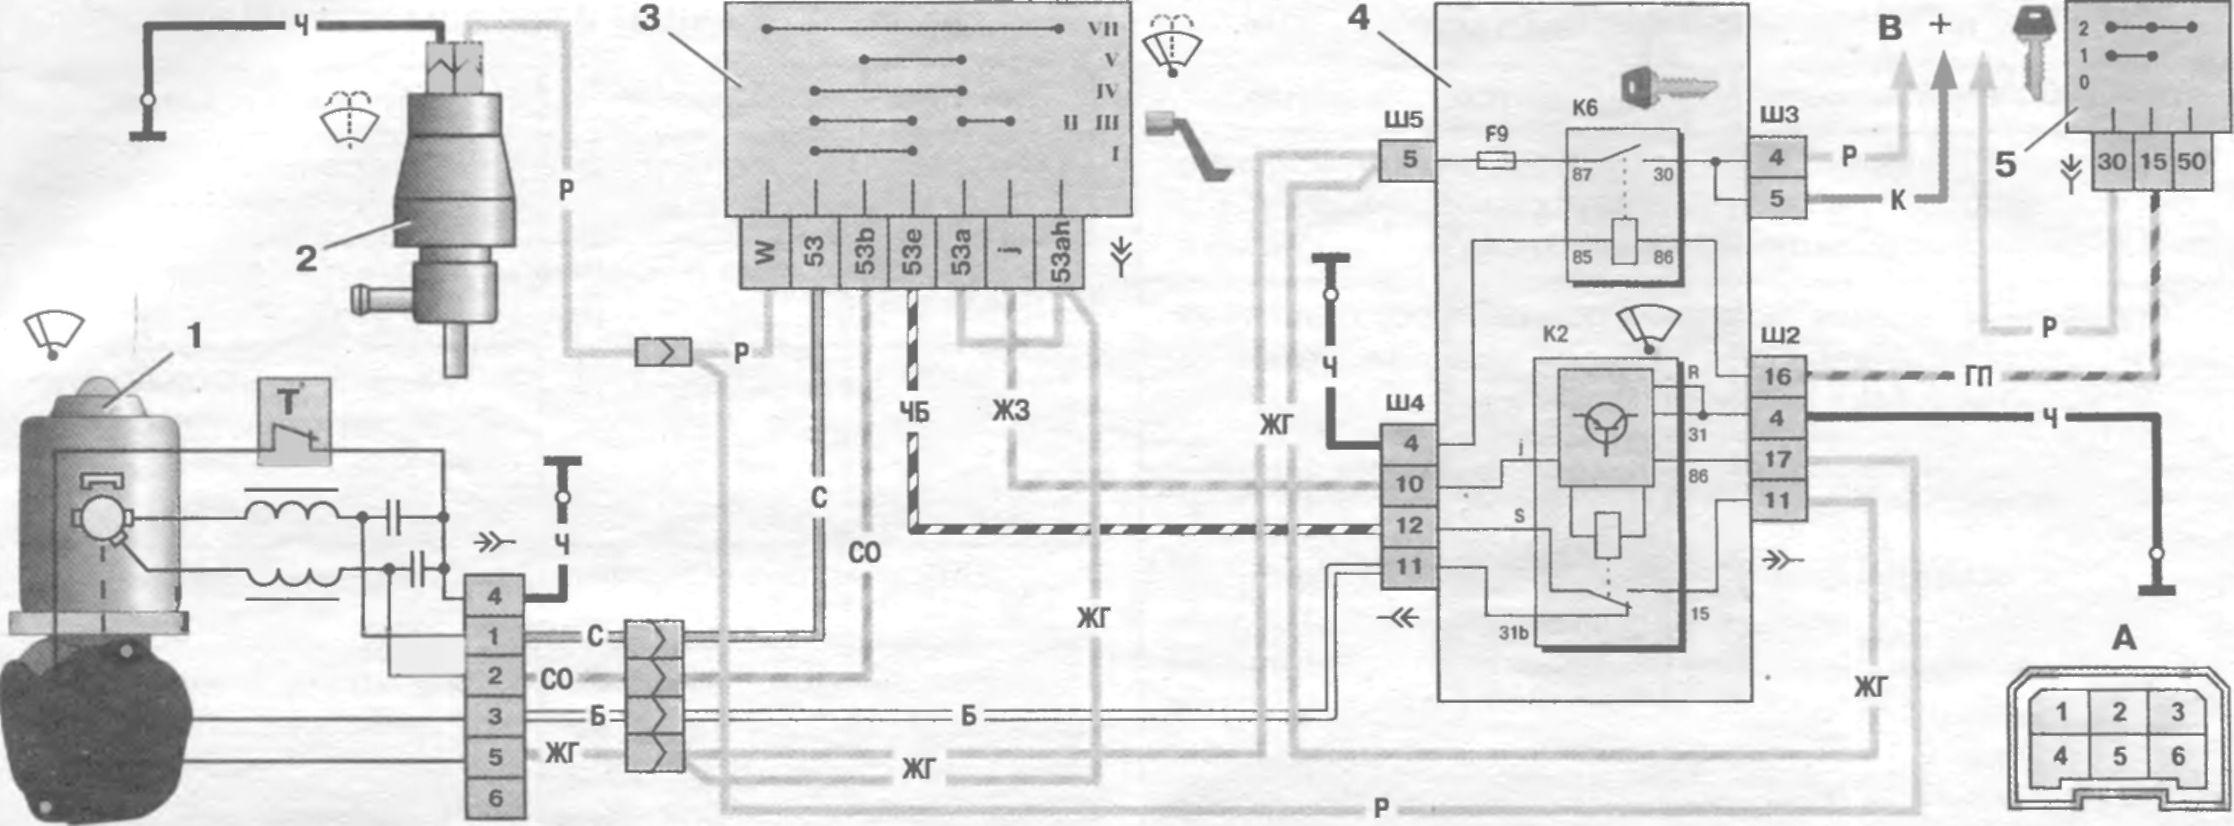 Схема подключения заднего дворника на ваз 2110